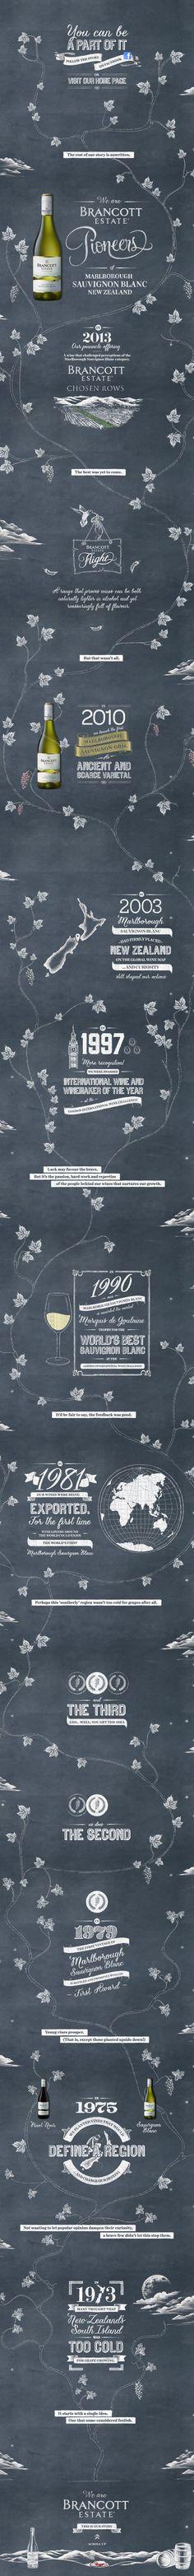 Brancott Estate. 40 years of wine-making history in a one page (upside-down) scroller. #webdesign #design (scheduled via http://www.tailwindapp.com?utm_source=pinterest&utm_medium=twpin&utm_content=post4060913&utm_campaign=scheduler_attribution)